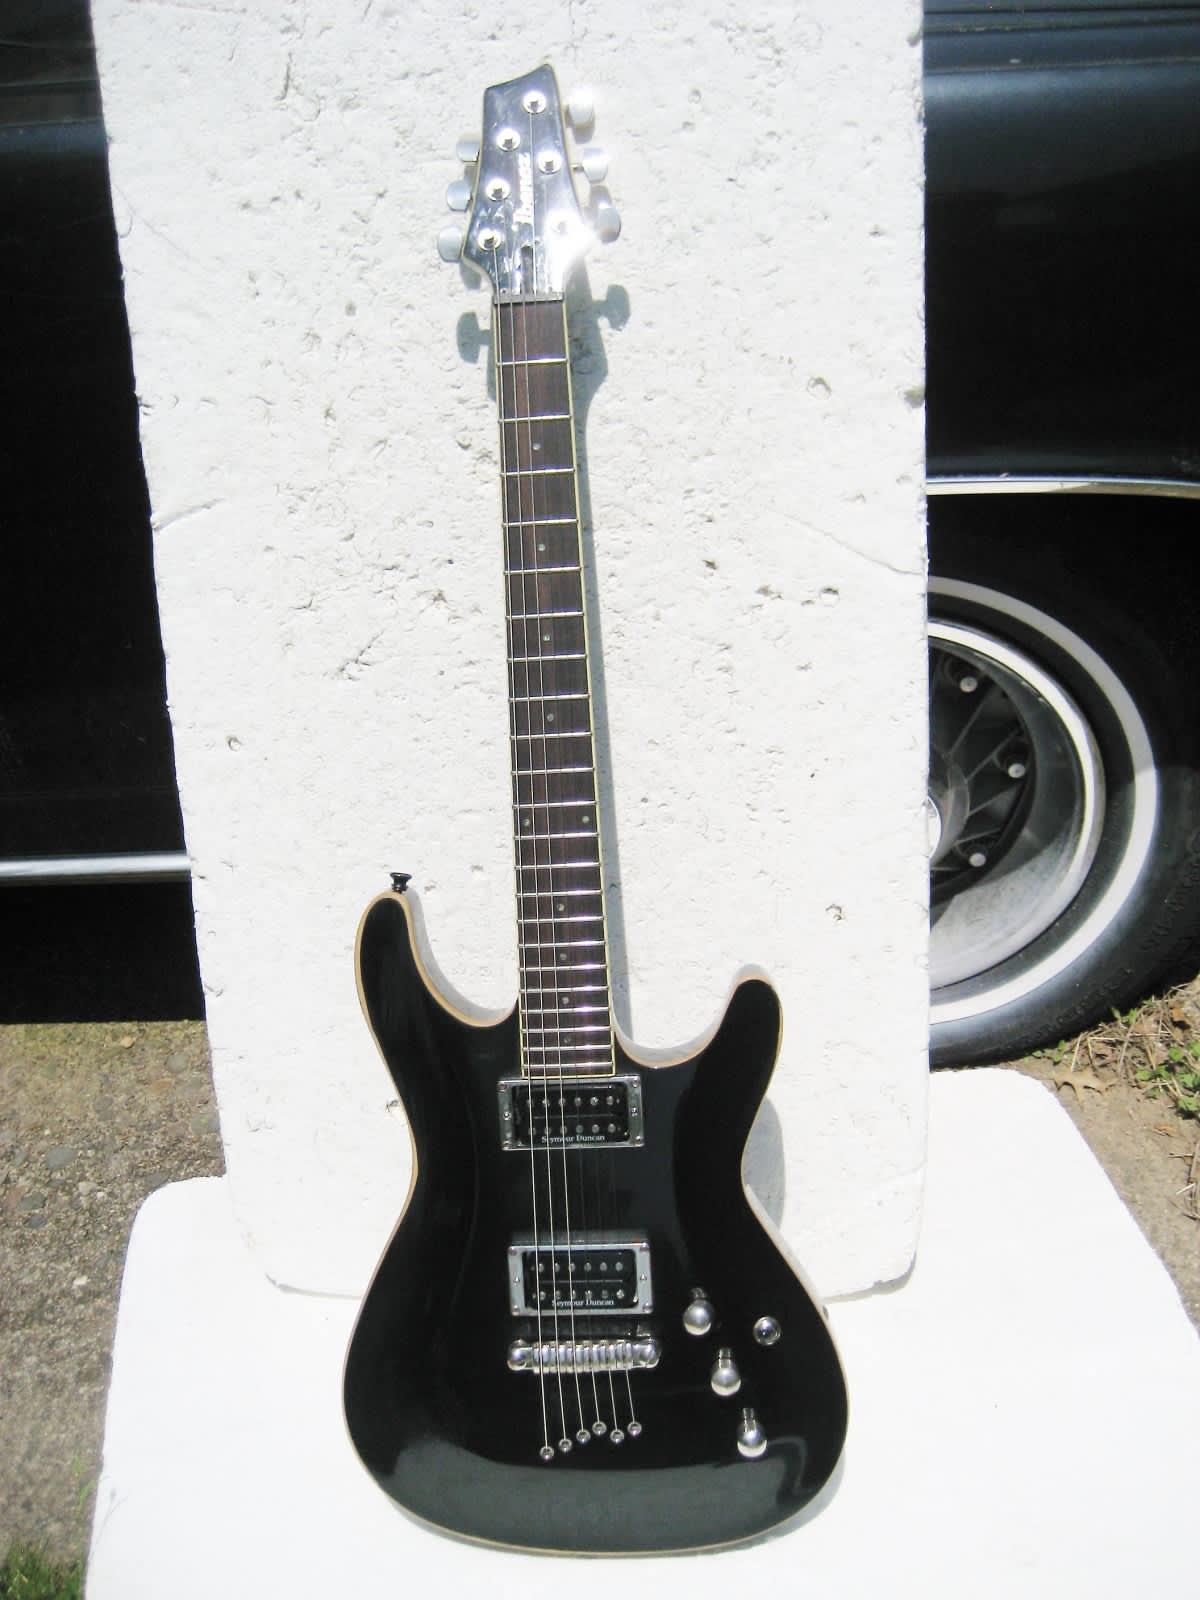 Jx T Mzej Mmnc Zbwfe on Seymour Duncan Guitar Pickups